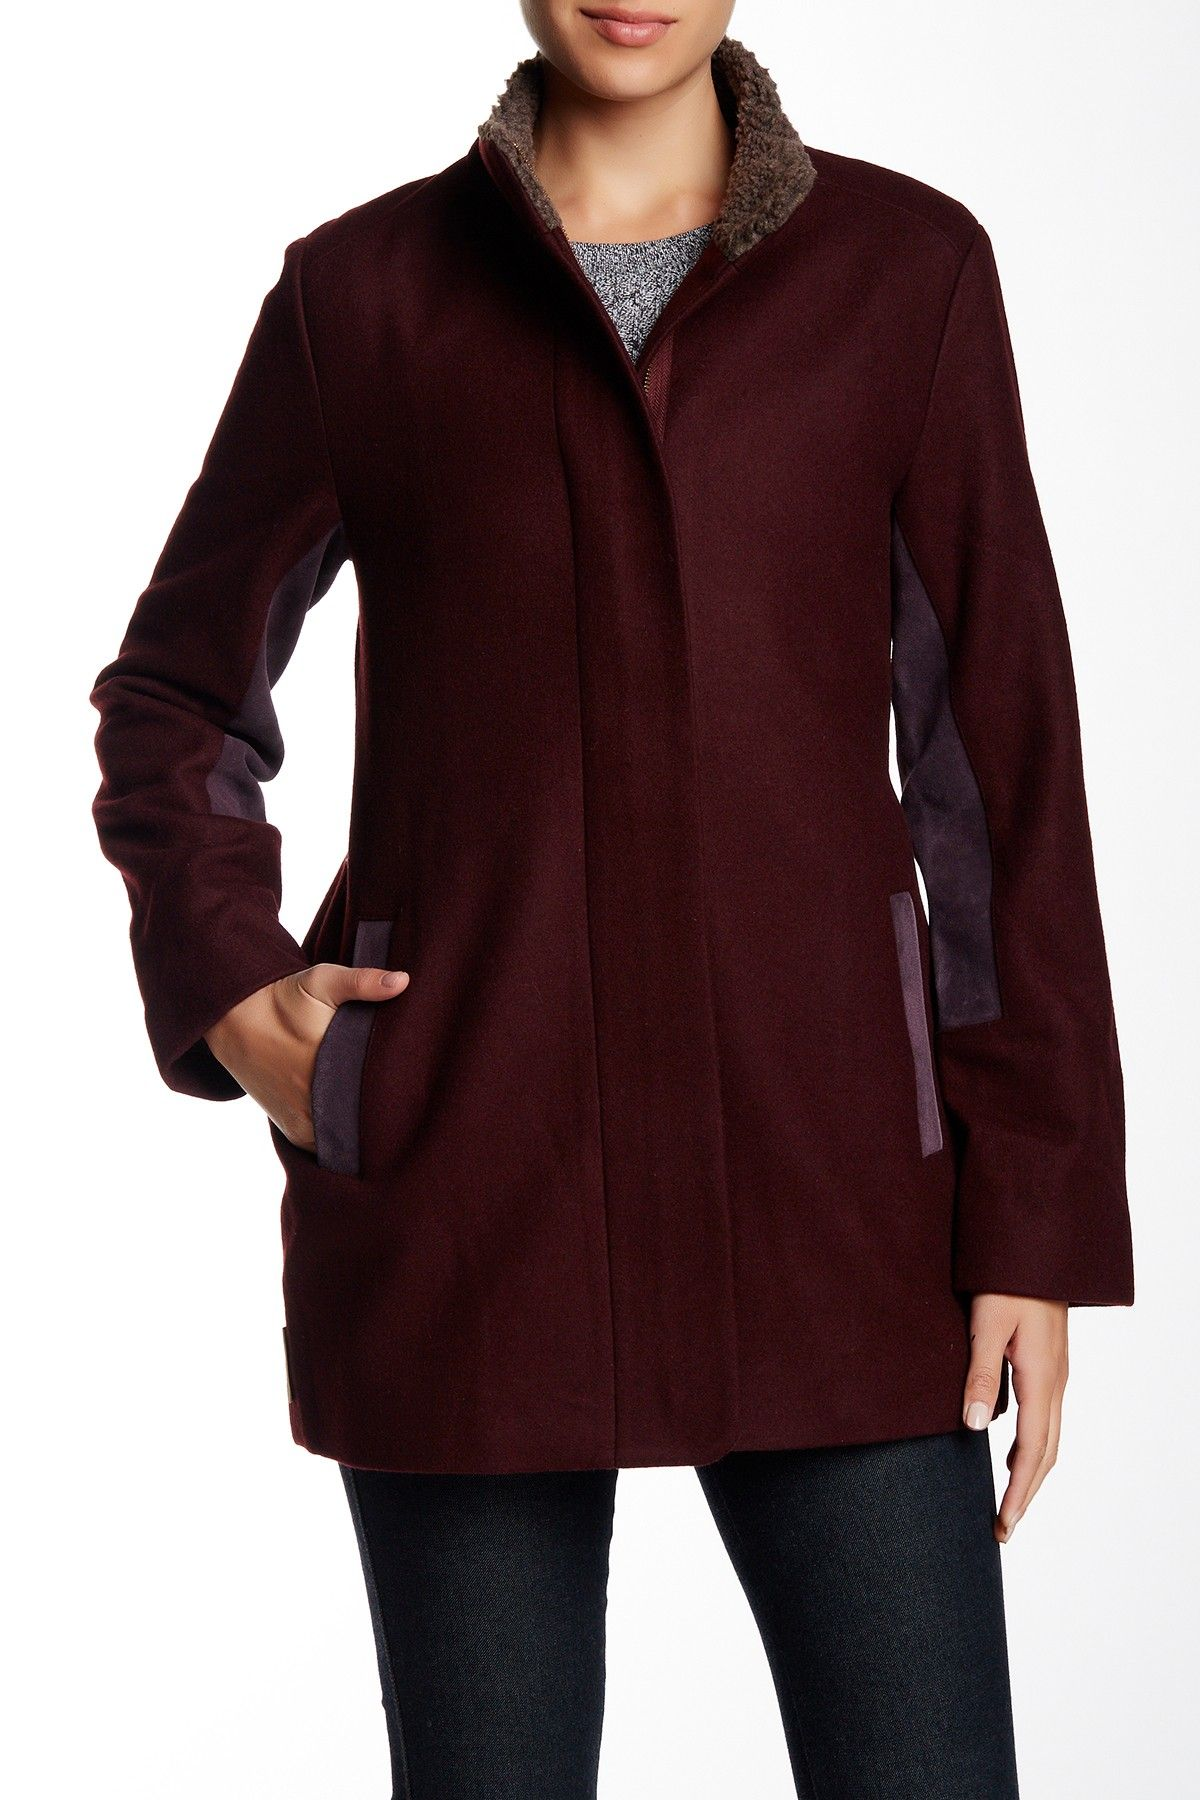 Shelley Faux Fur Trim Wool Blend Coat by UGG Australia on @nordstrom_rack